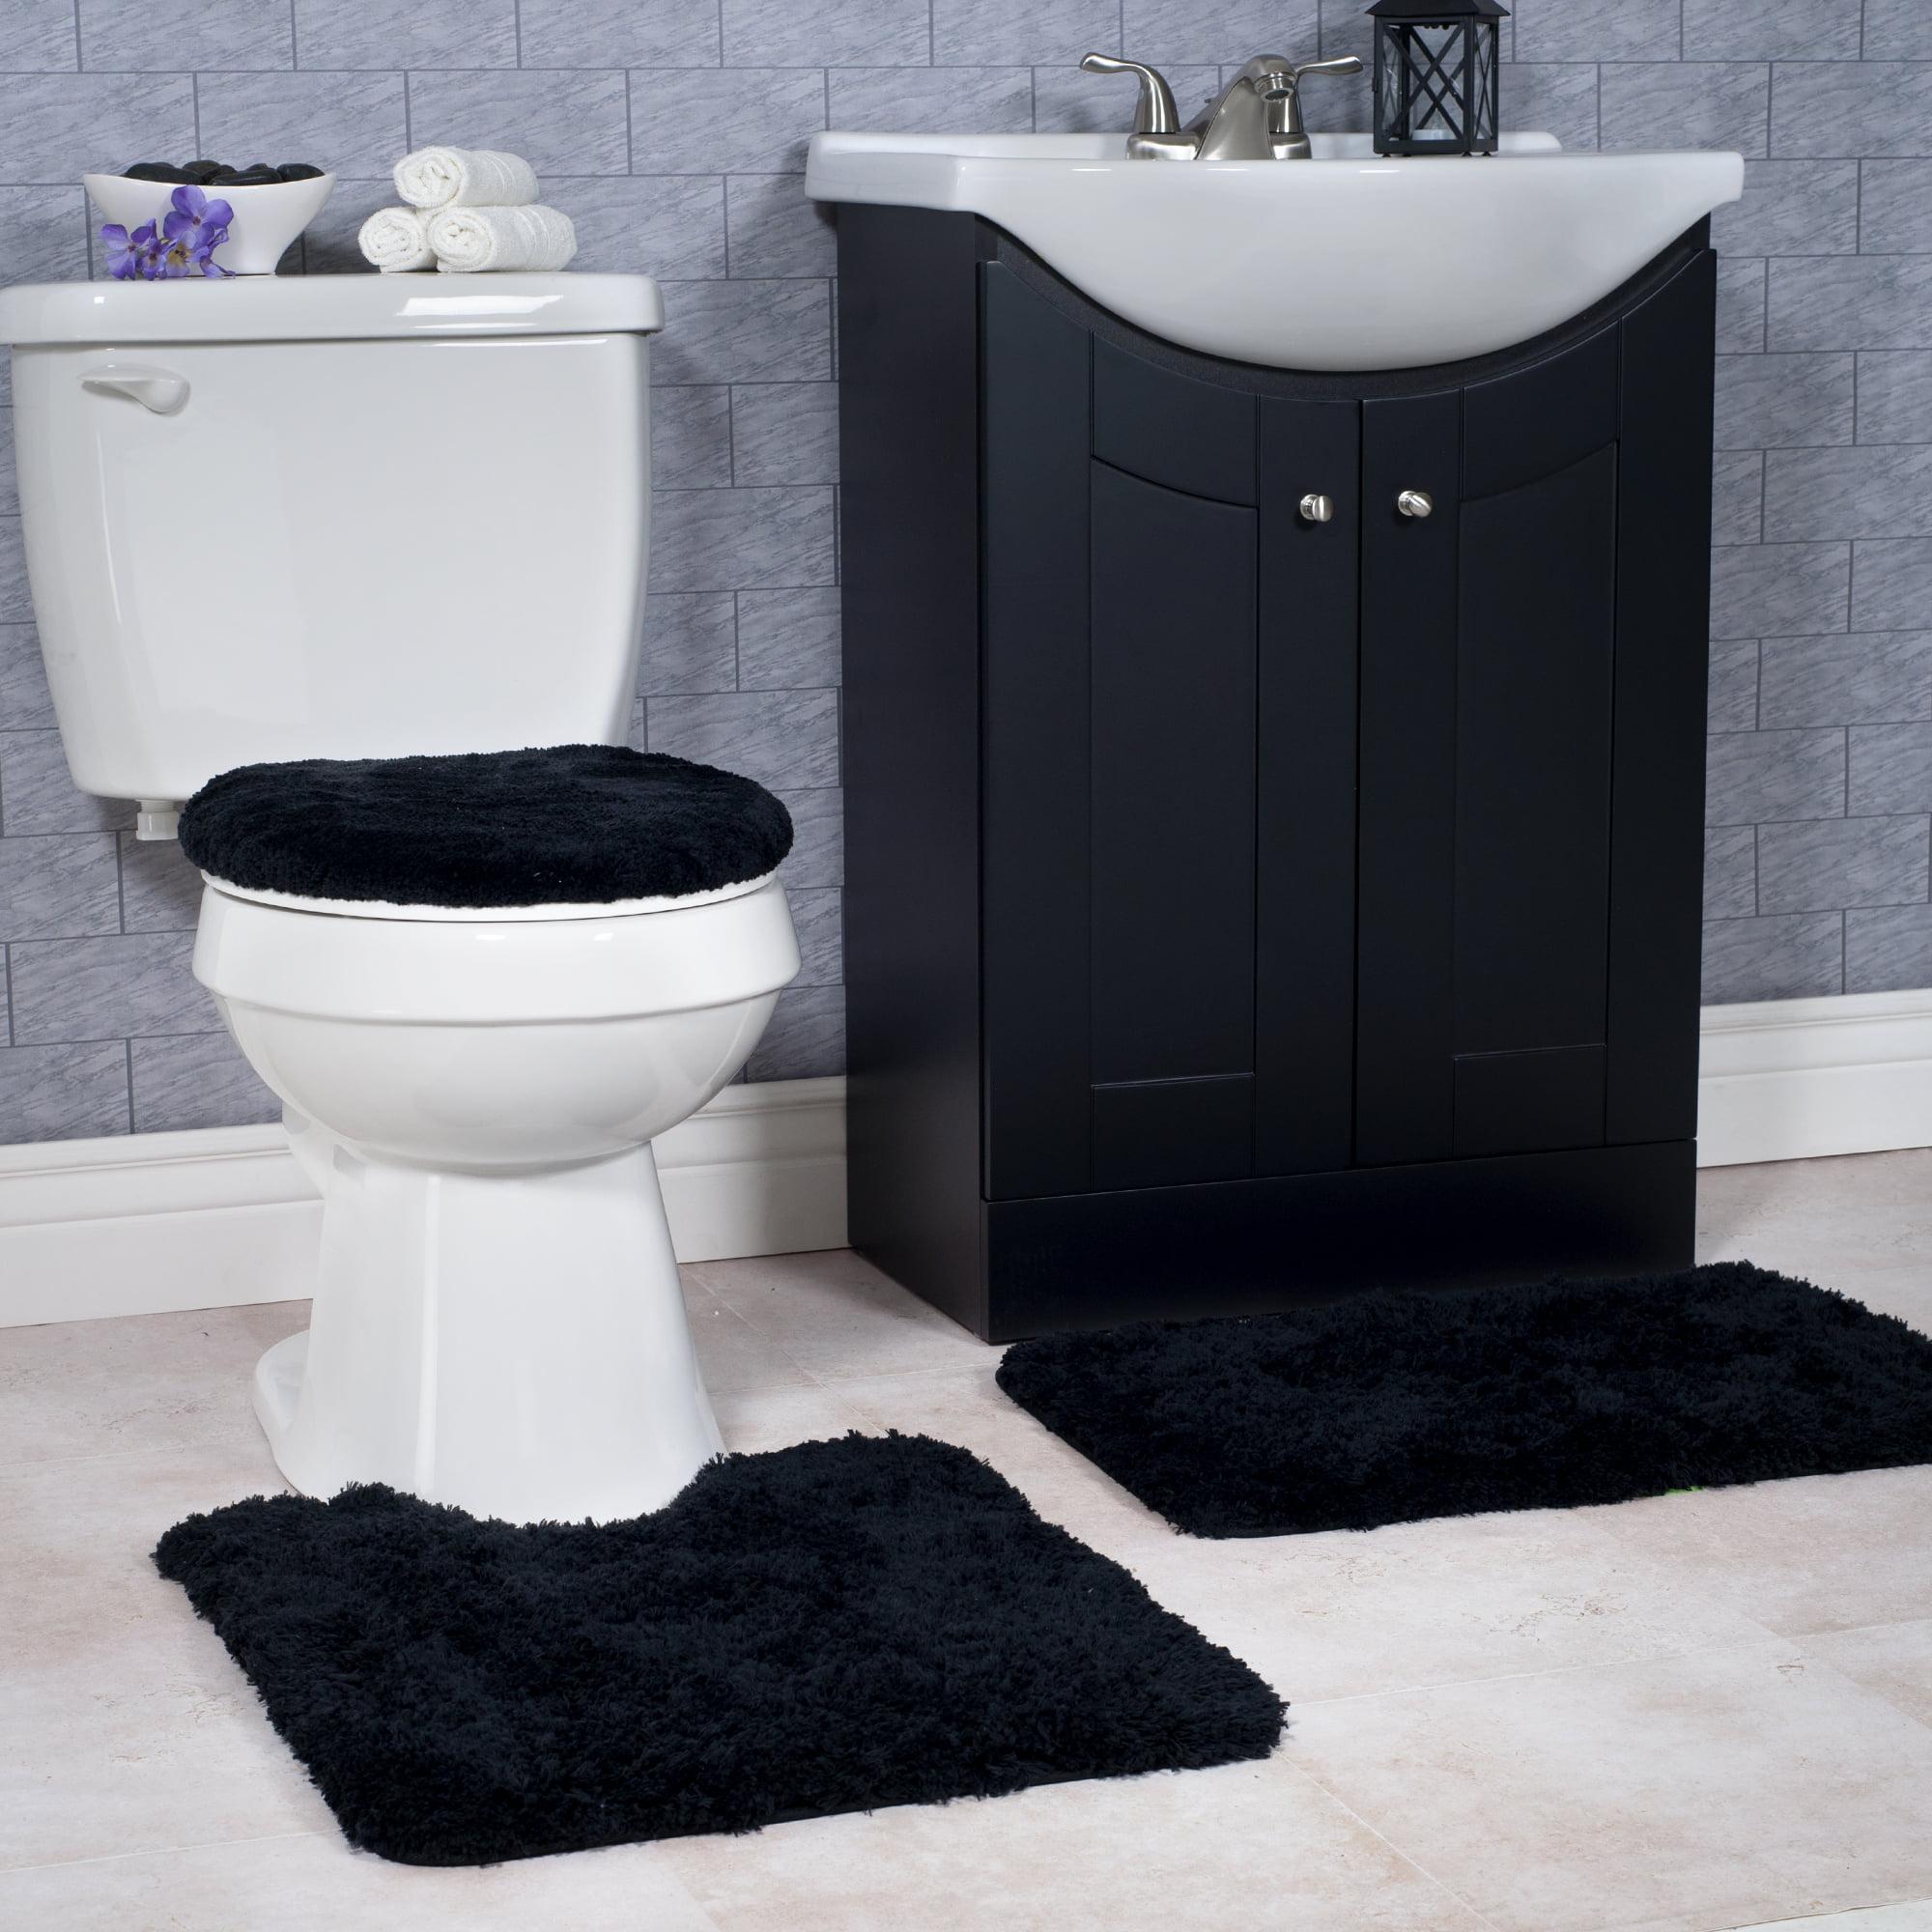 Somerset Home 3 Piece Super Plush Non-Slip Bath Rug Set - Black